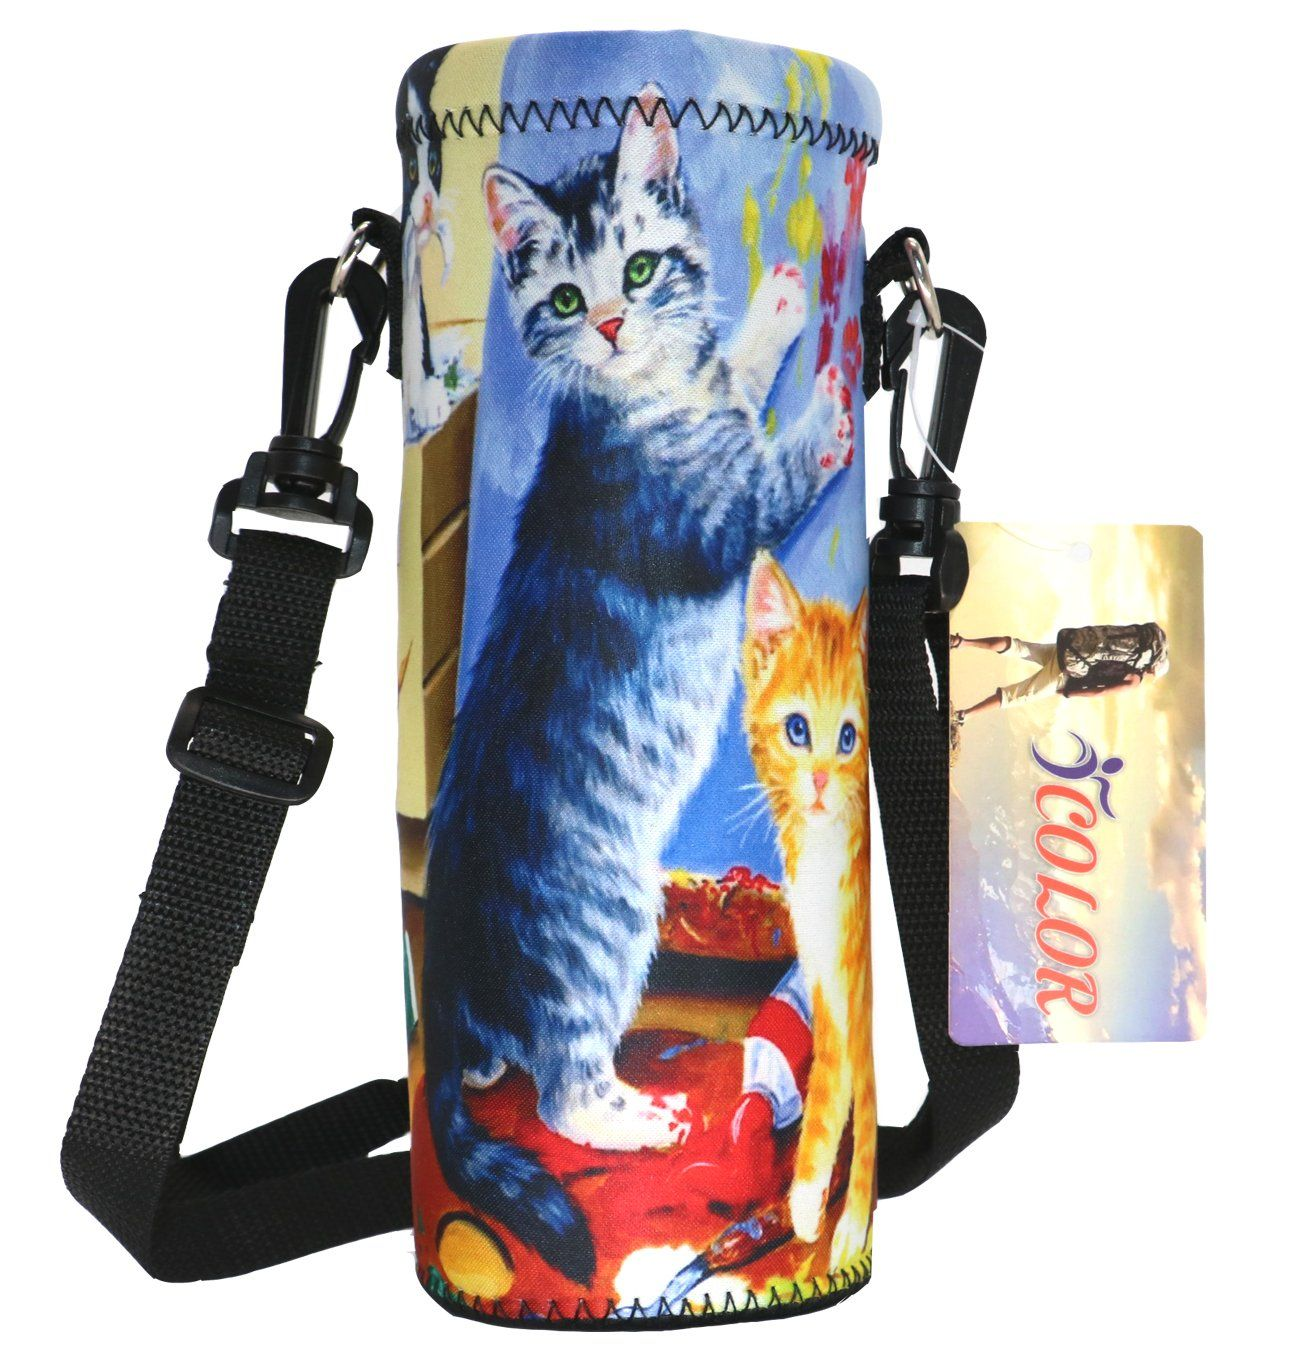 Bluewave Lifestyle GEN3 Water Bottle Carrying Holder Case